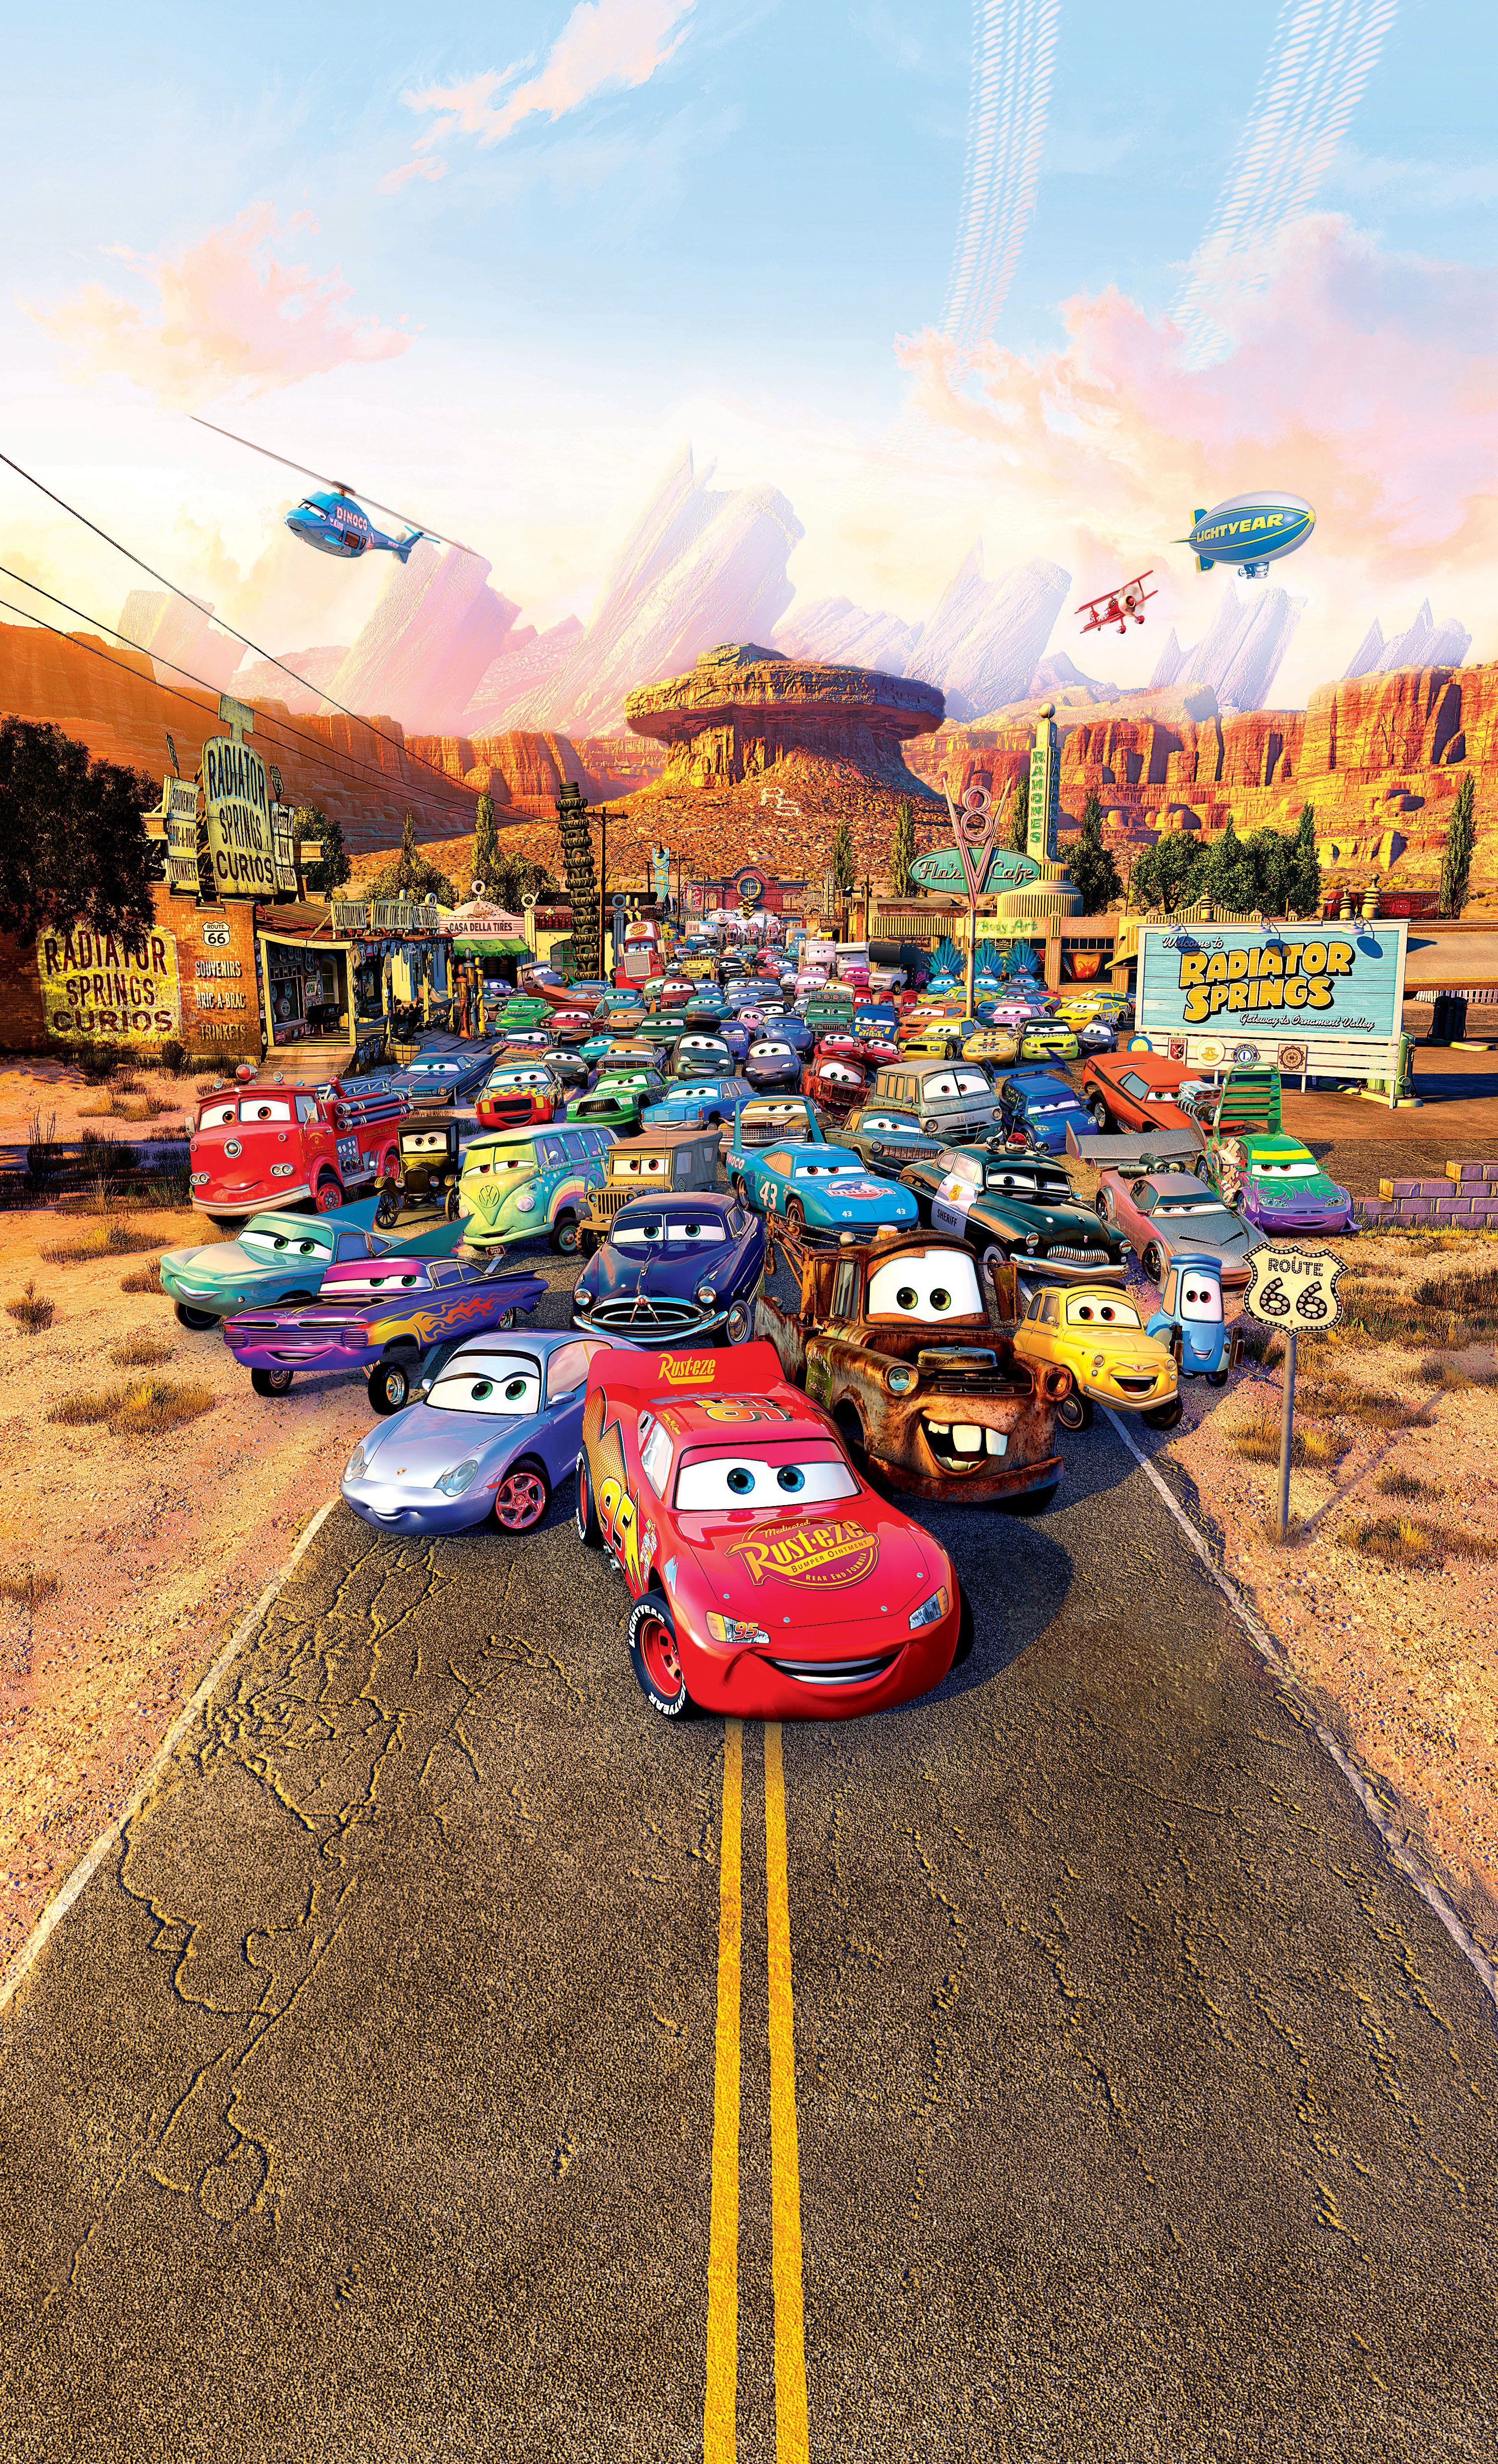 Cars (2006) 車 映画, ピクサー映画